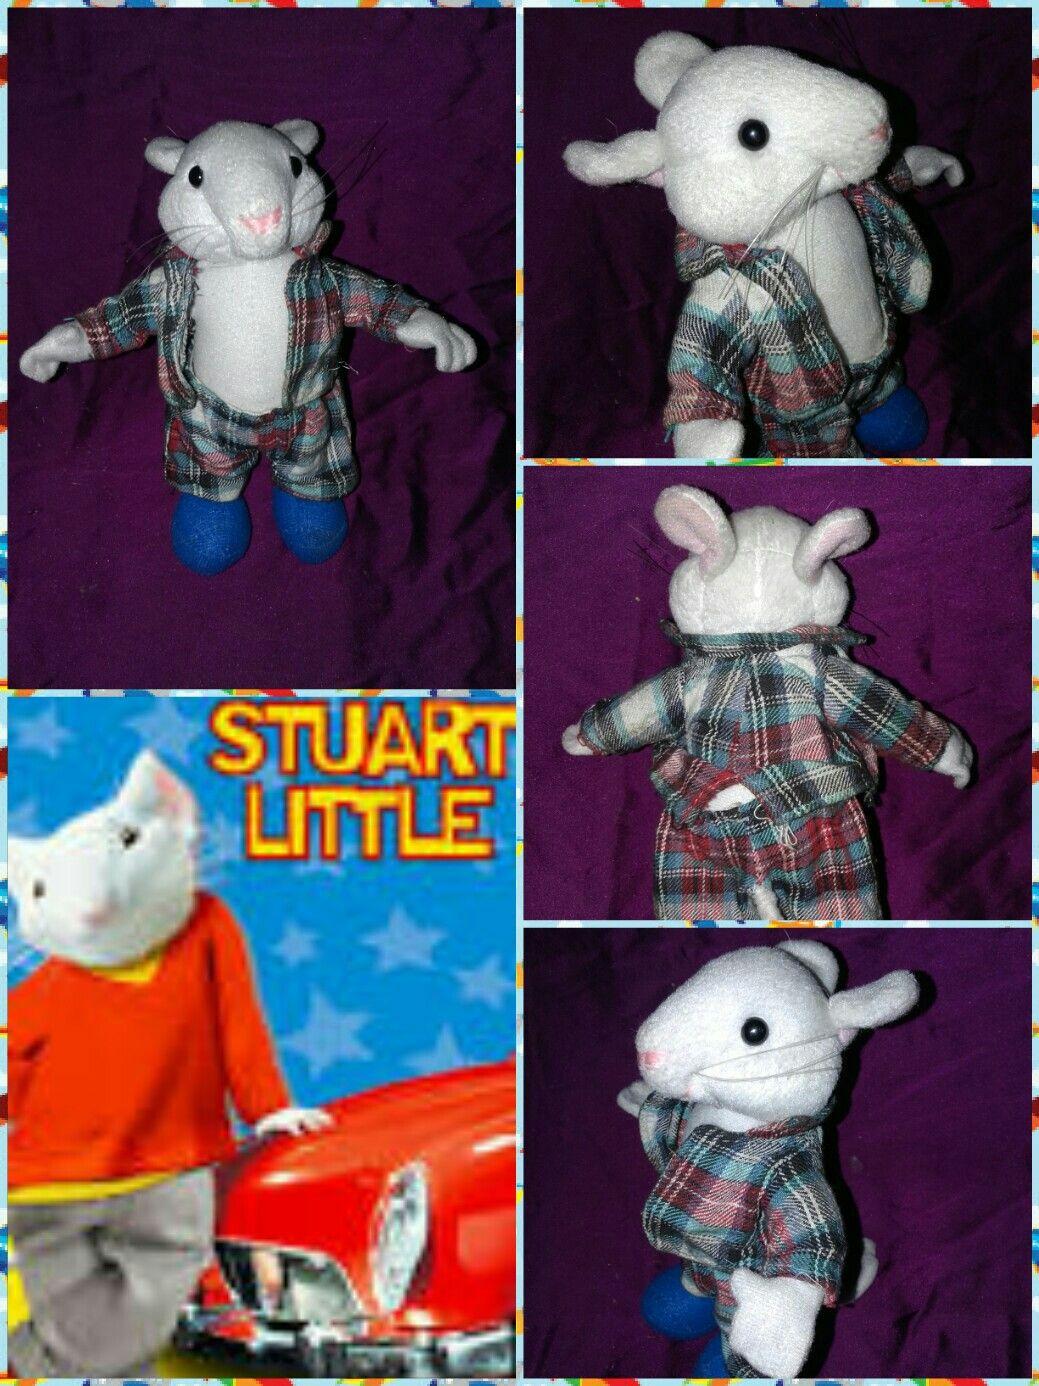 Stuart Little Con Ropa Ratoncito Pel Cula 18cm # Muebles Bebotes